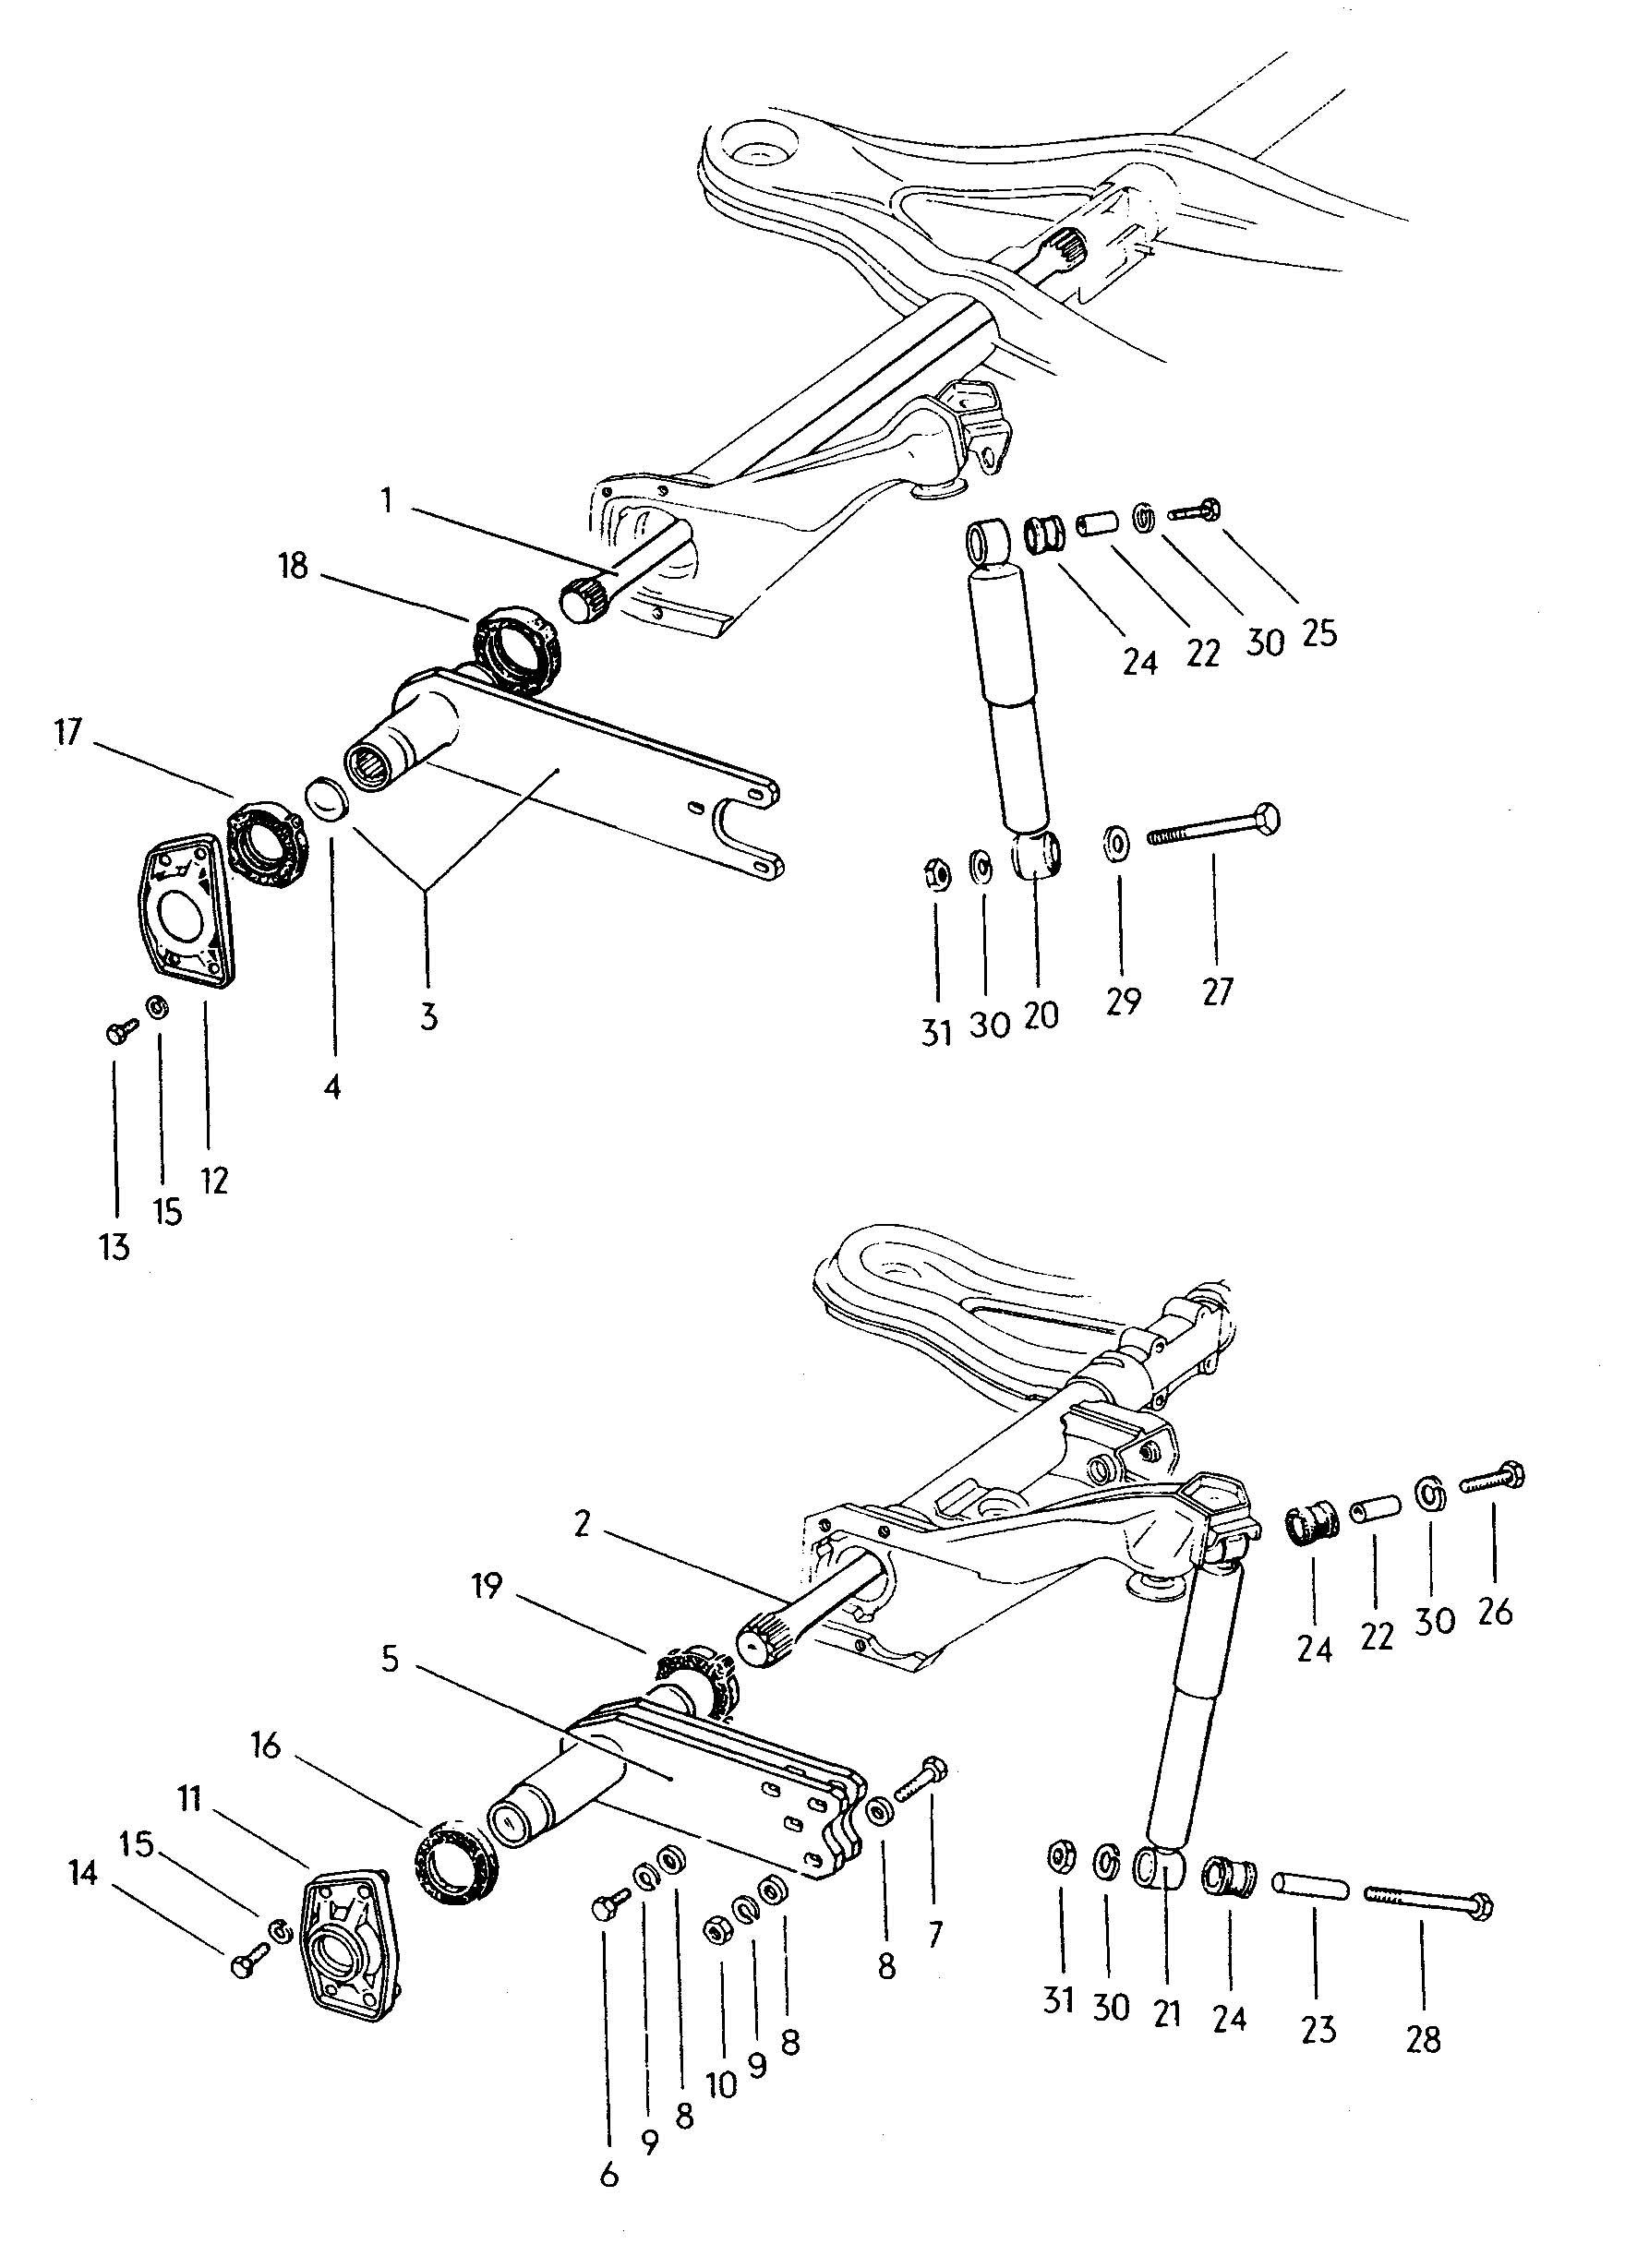 Volkswagen Type 3 Shock Absorber Torsion Bar Rear